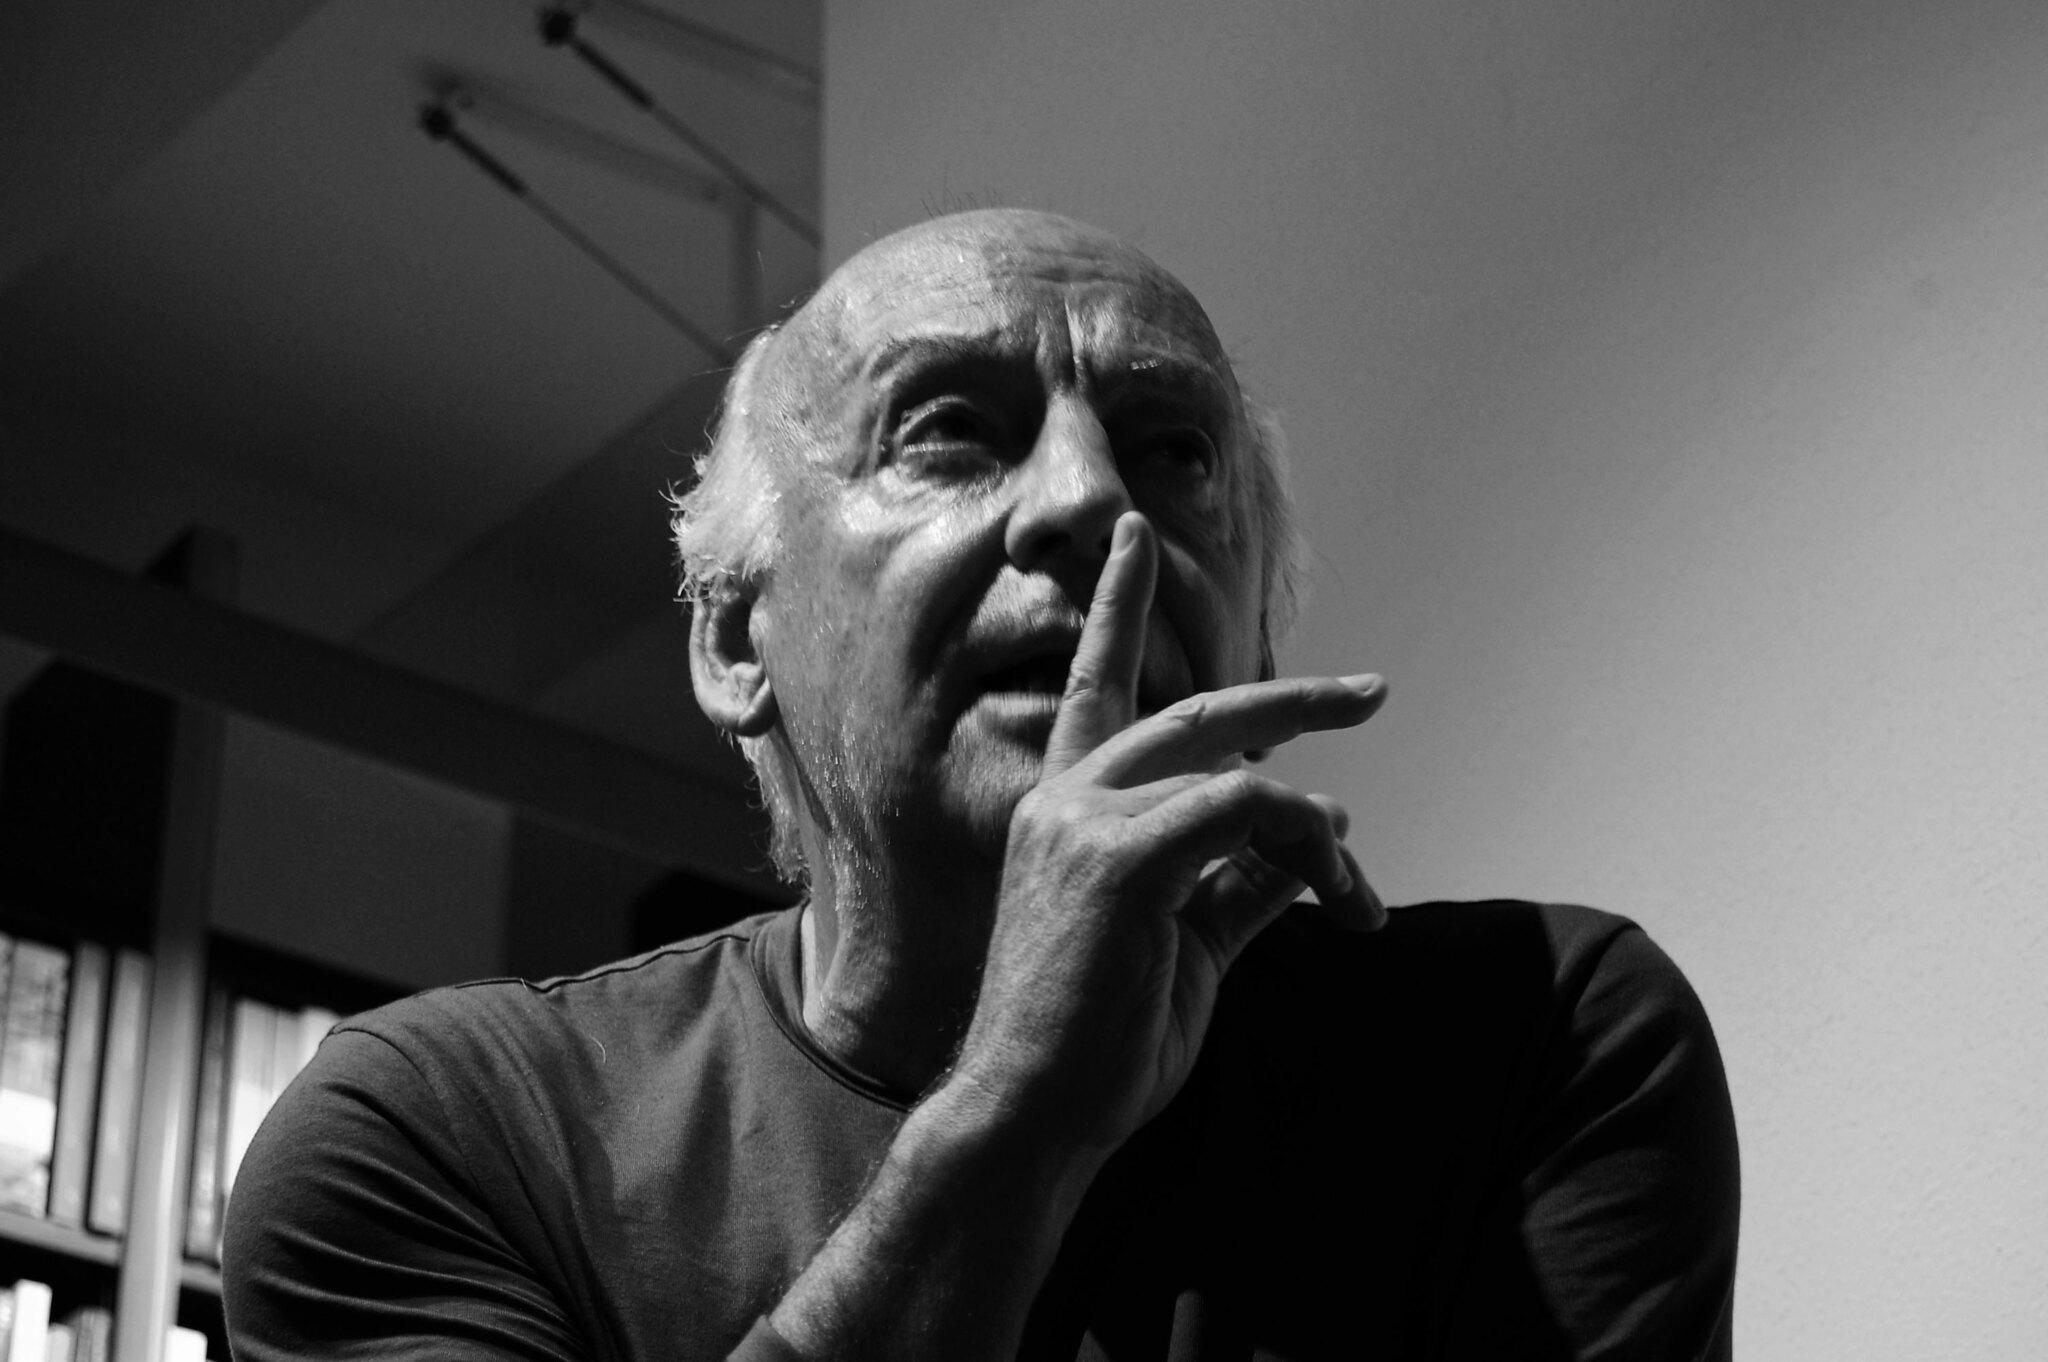 Música para recordar a Eduardo Galeano (a un lustro de su partida)